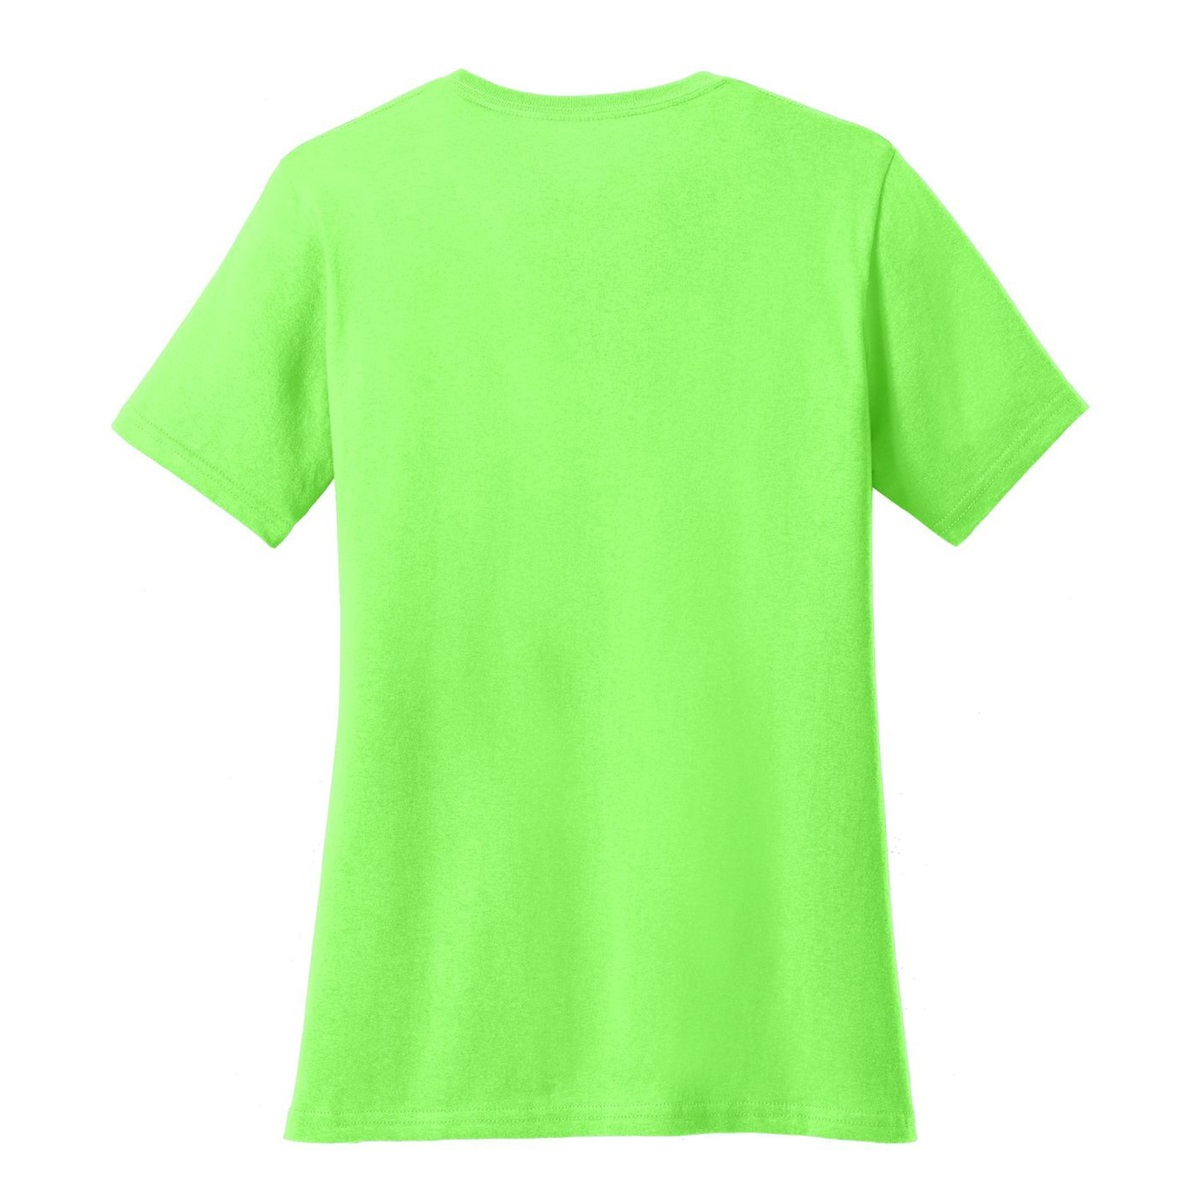 Port Company Lpc54 Ladies 5 4 Oz Cotton T Shirt Neon